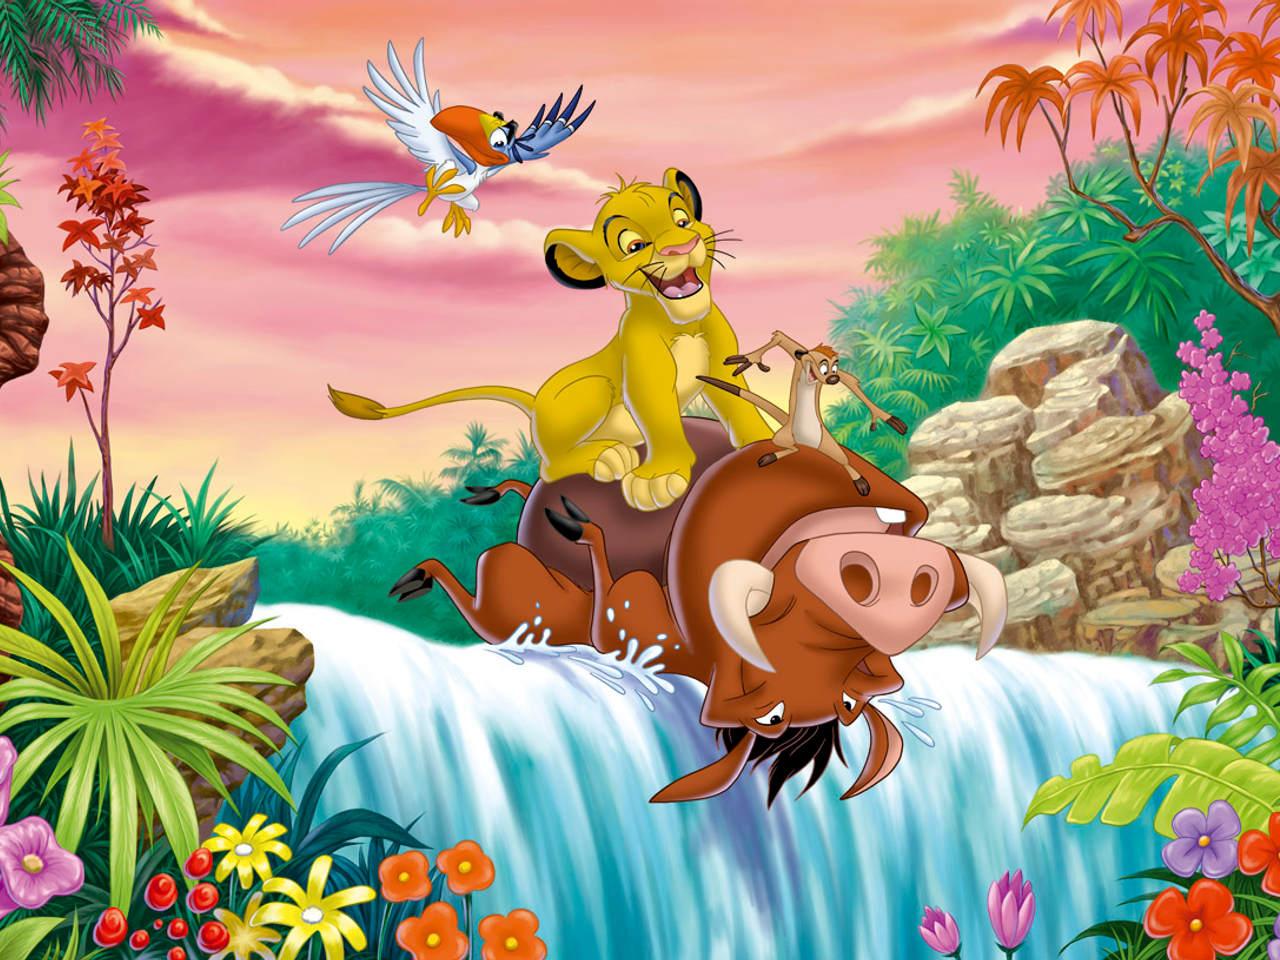 The lion king wallpaper disney desktop wallpaper free for El mural pelicula